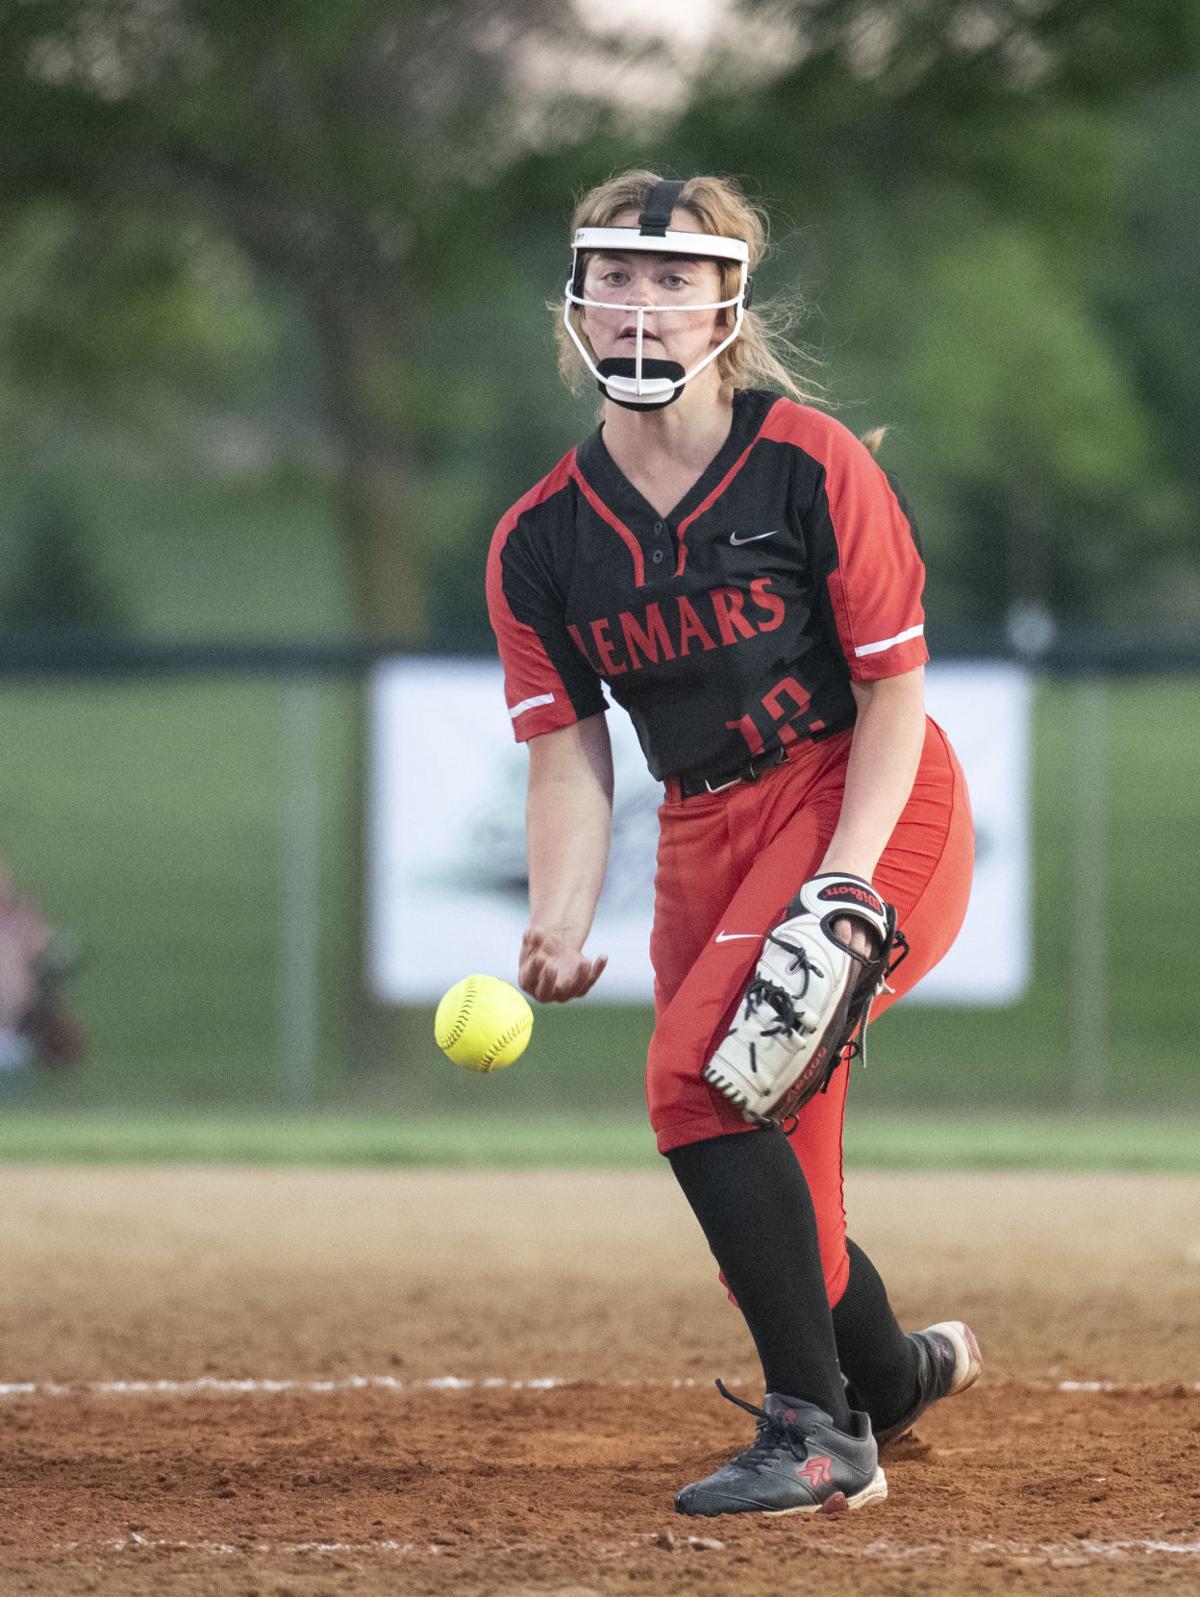 West vs Le Mars softball